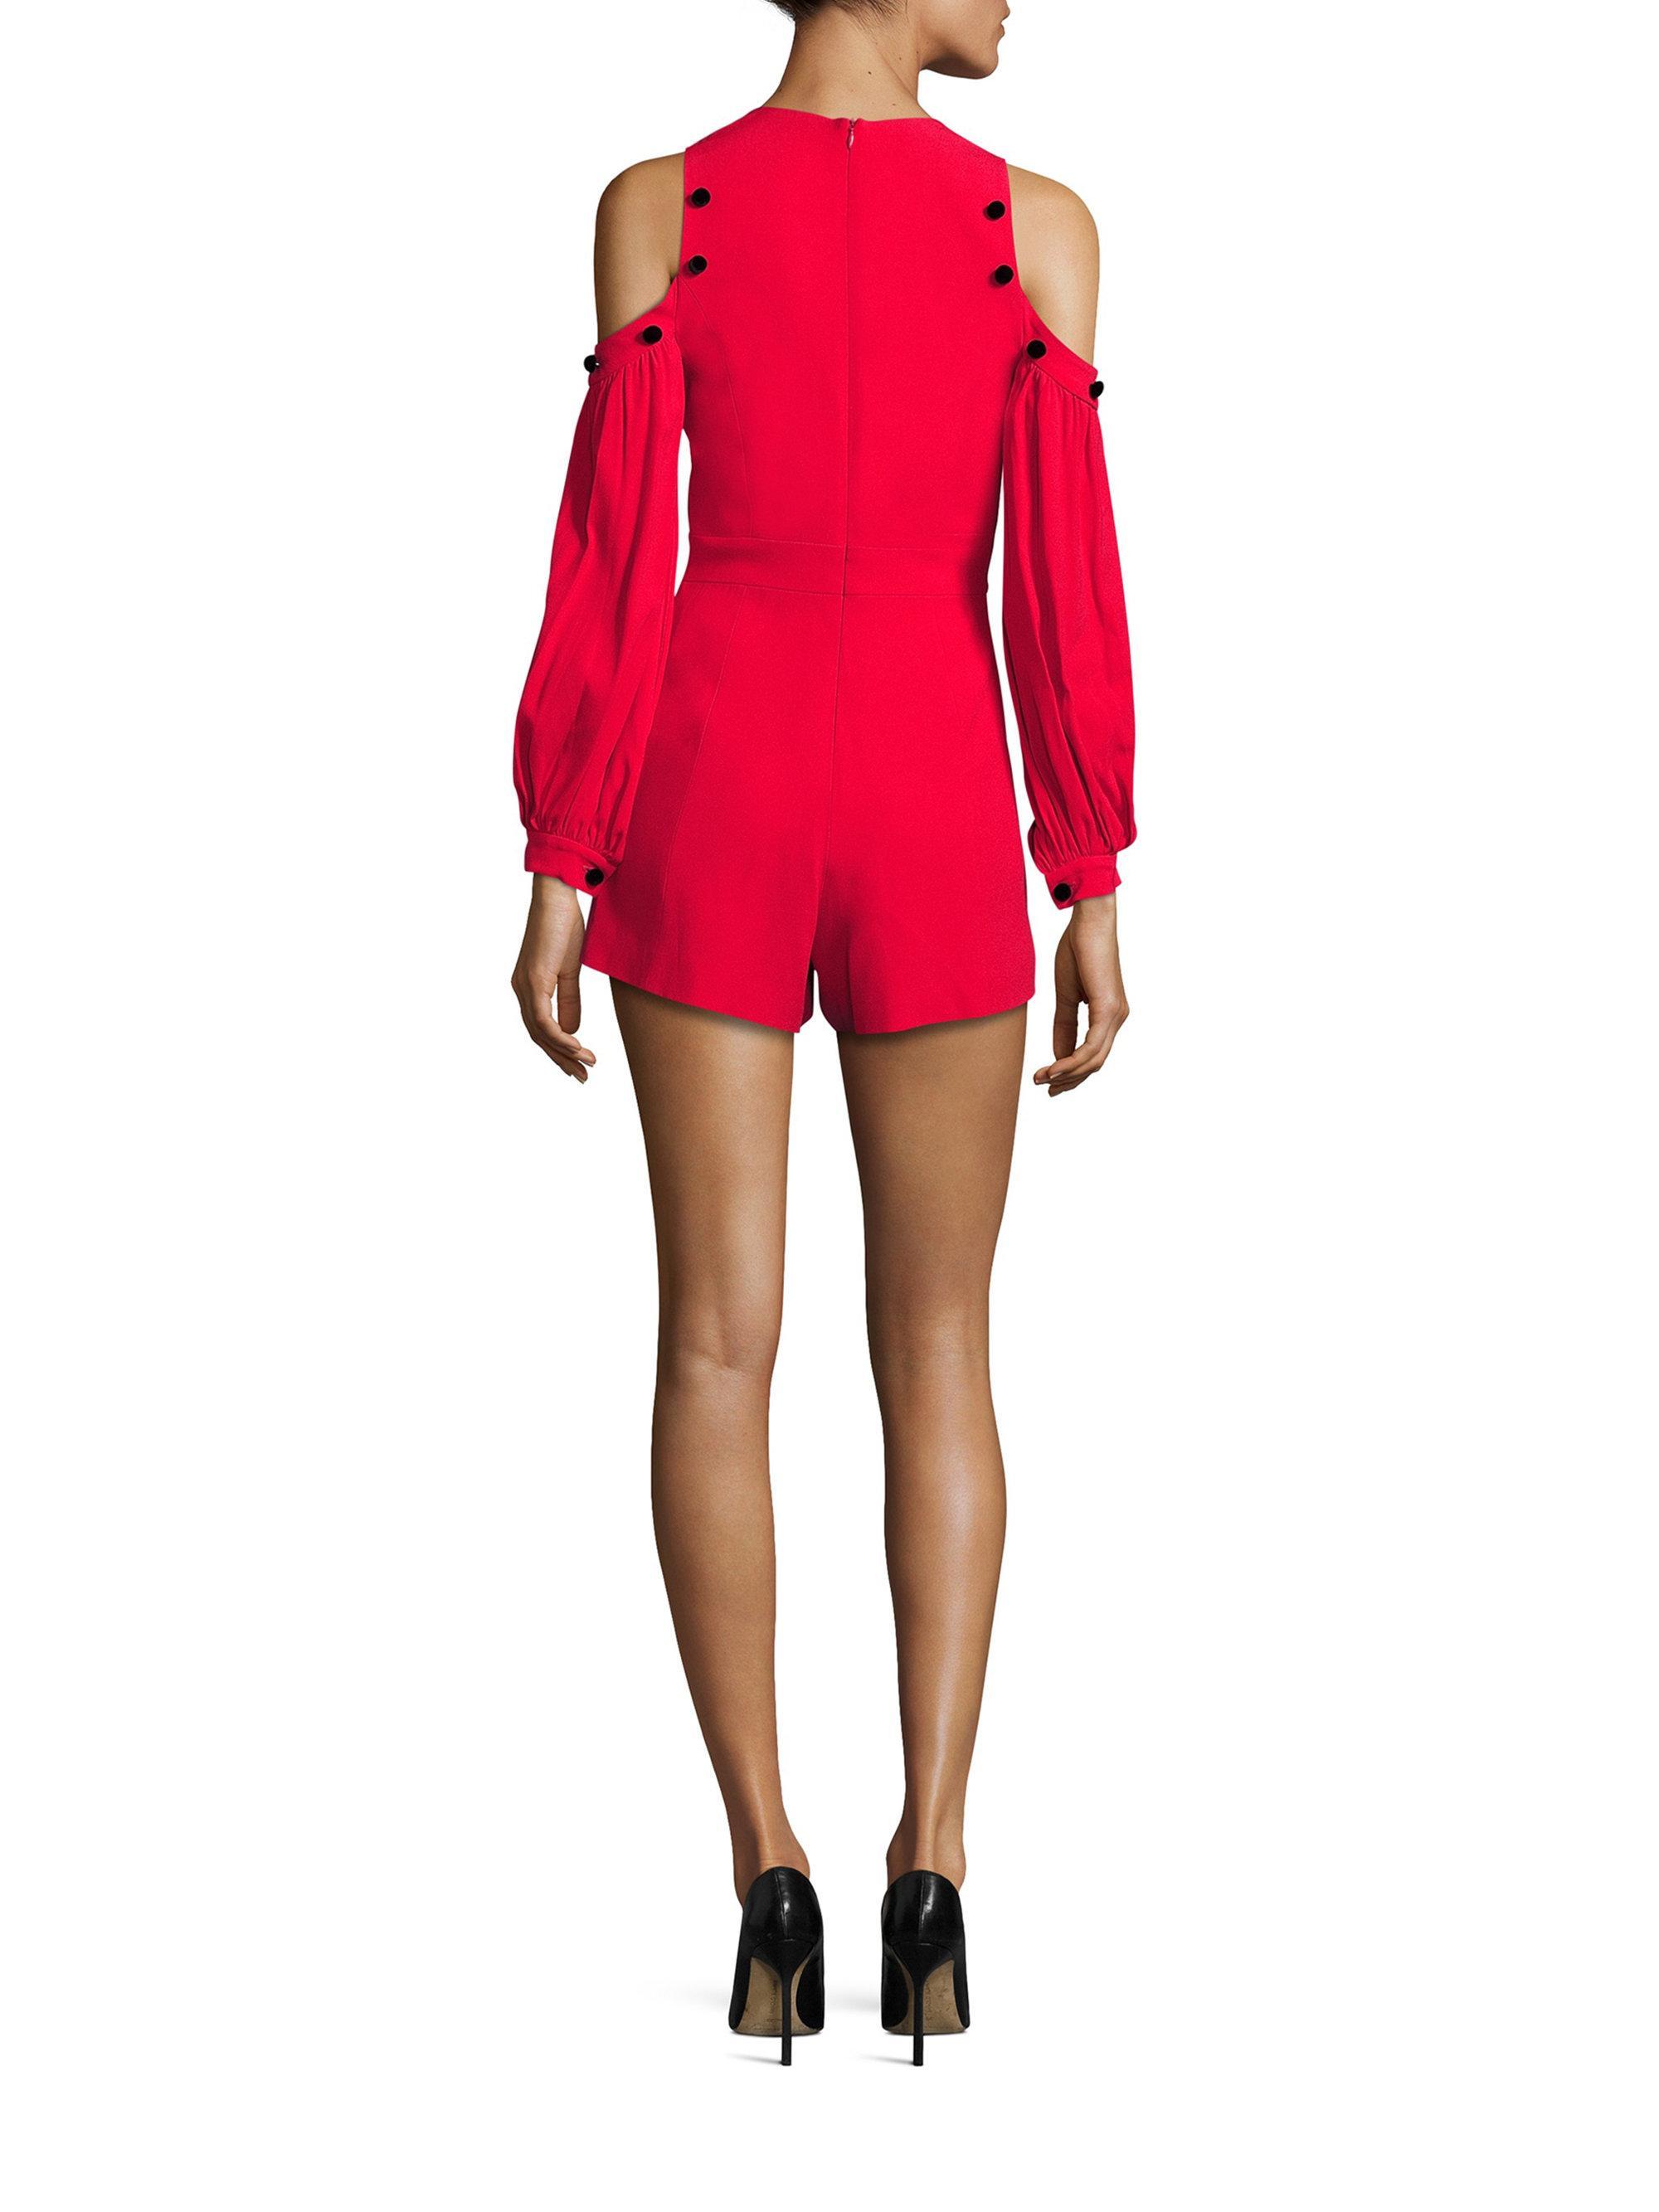 24c79d3615c Lyst - Alexis Asher Button Trim Cold Shoulder Jumpsuit in Red